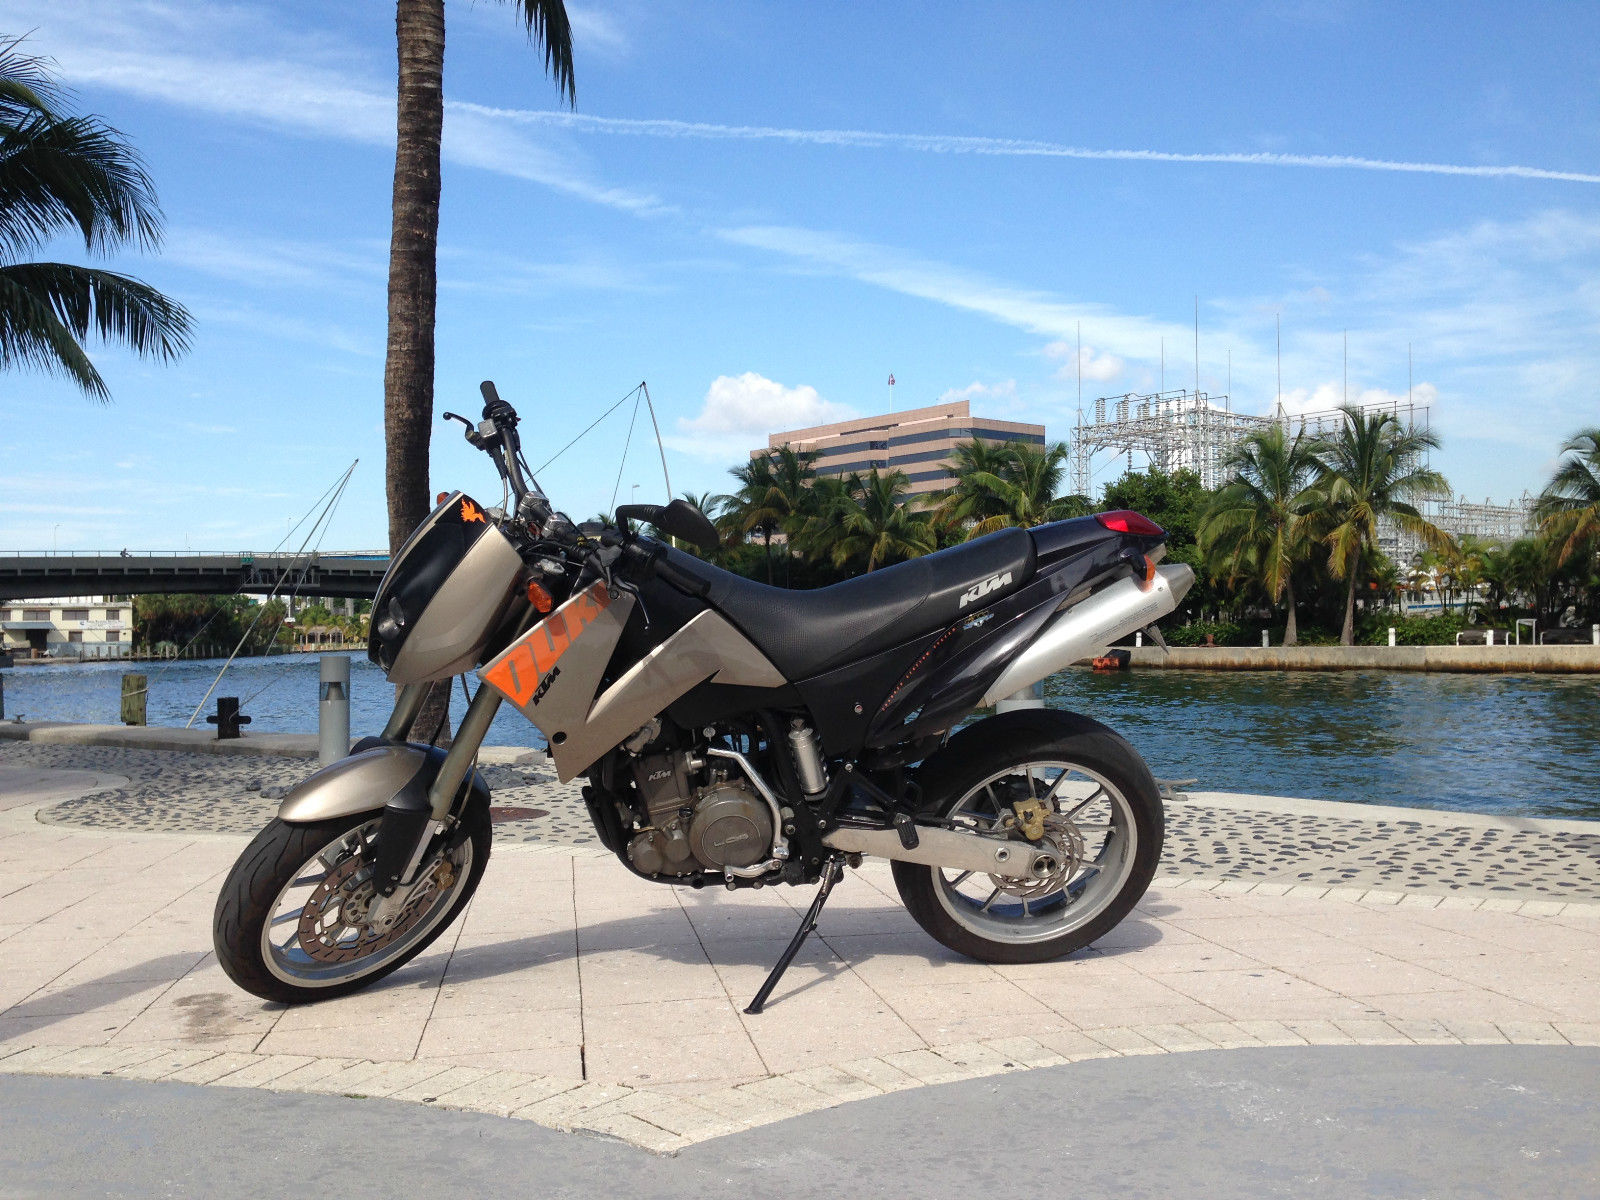 2000 ktm duke 2 640 cc supermoto super moto motard. Black Bedroom Furniture Sets. Home Design Ideas